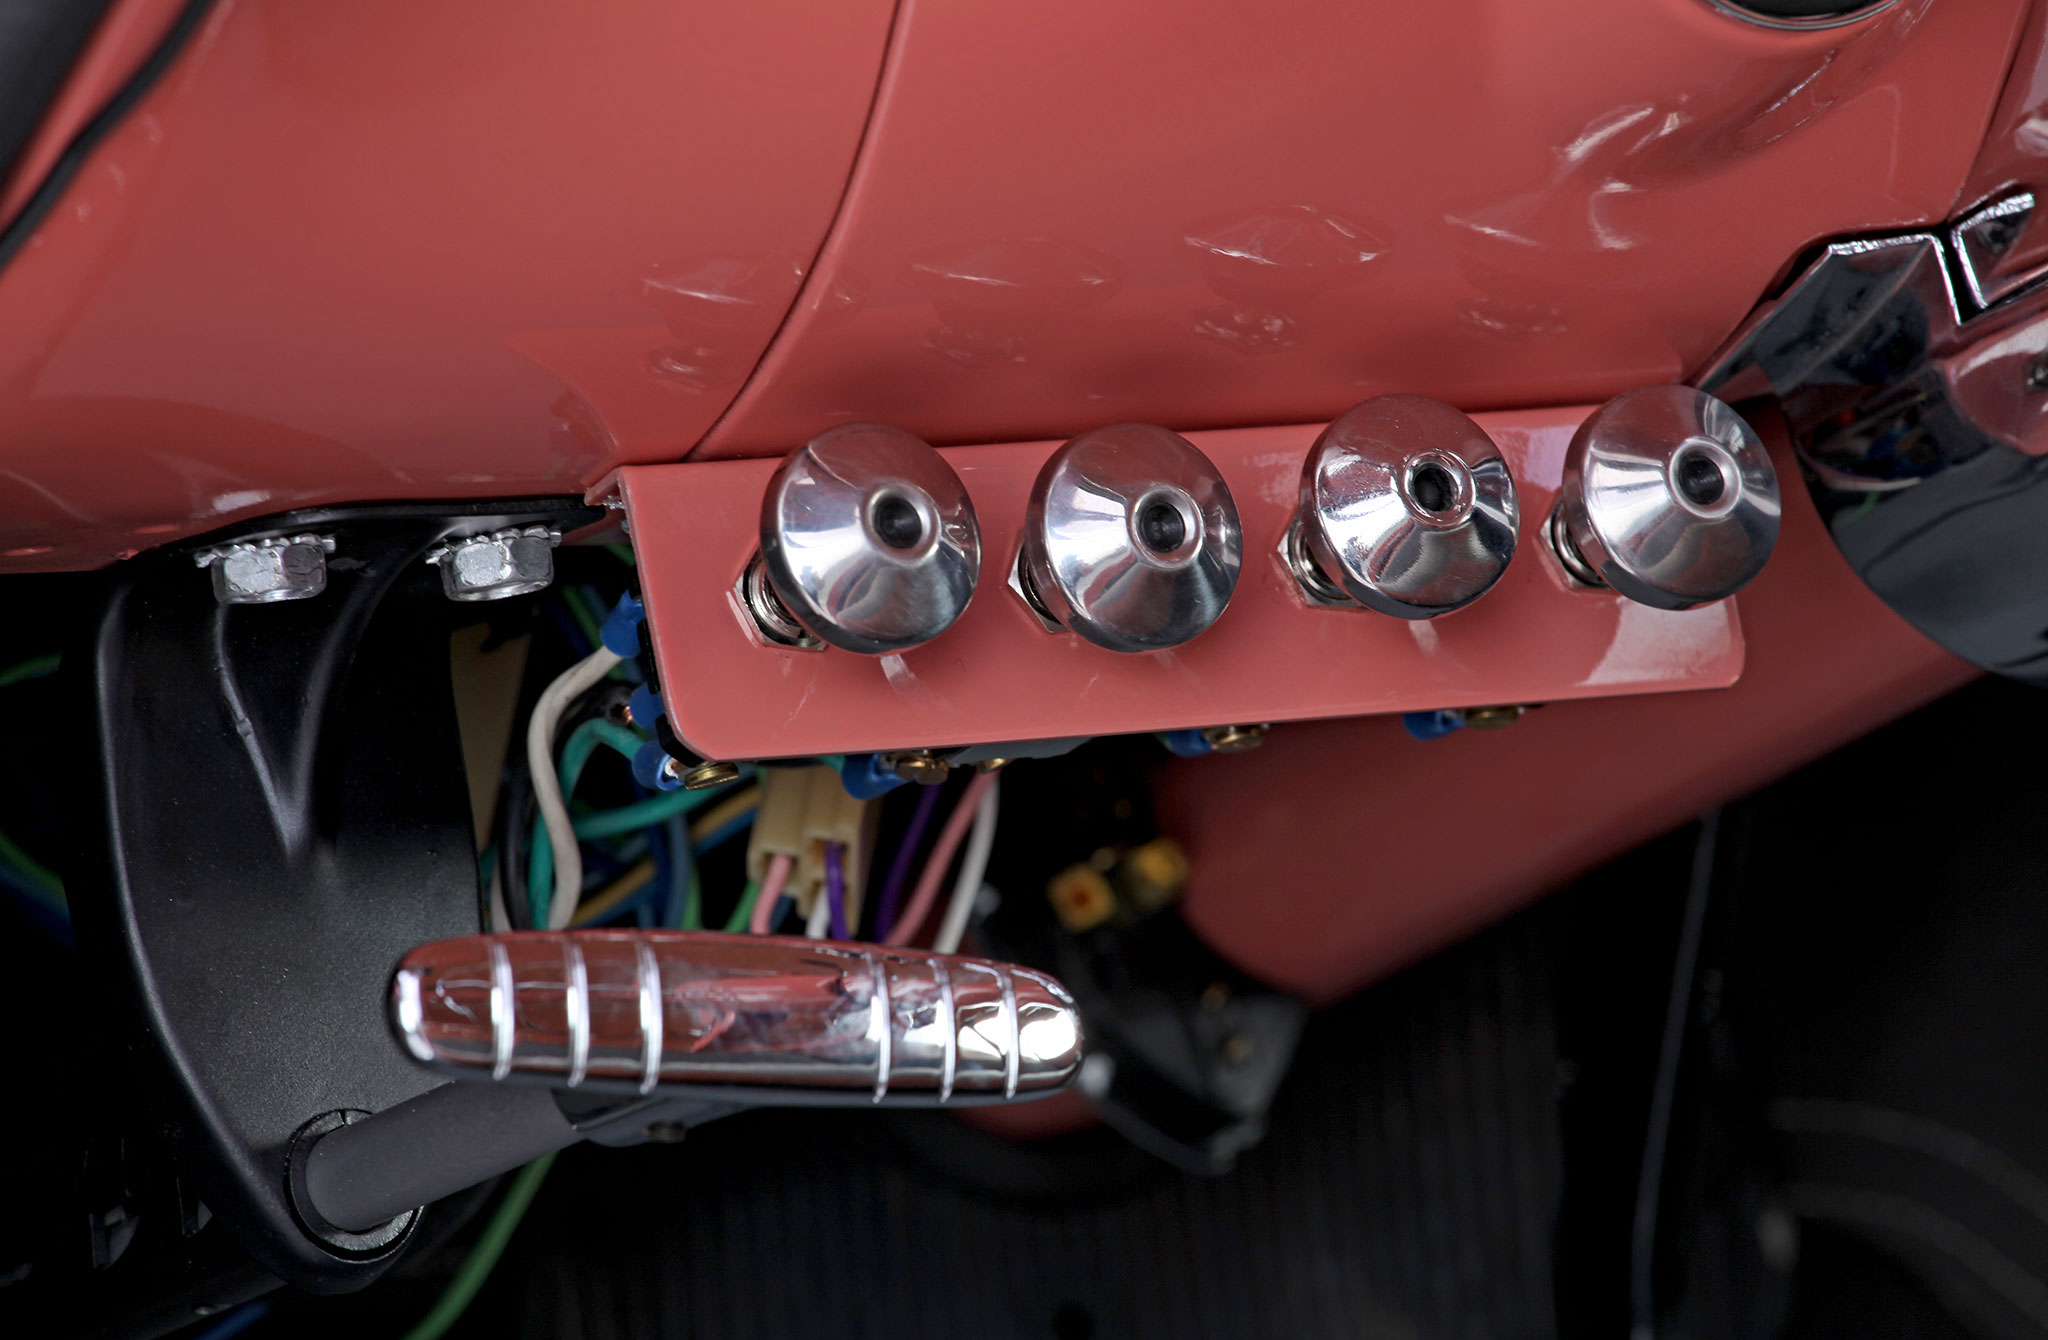 55 Chevy Fuse Box Location - Meta Wiring Diagrams on